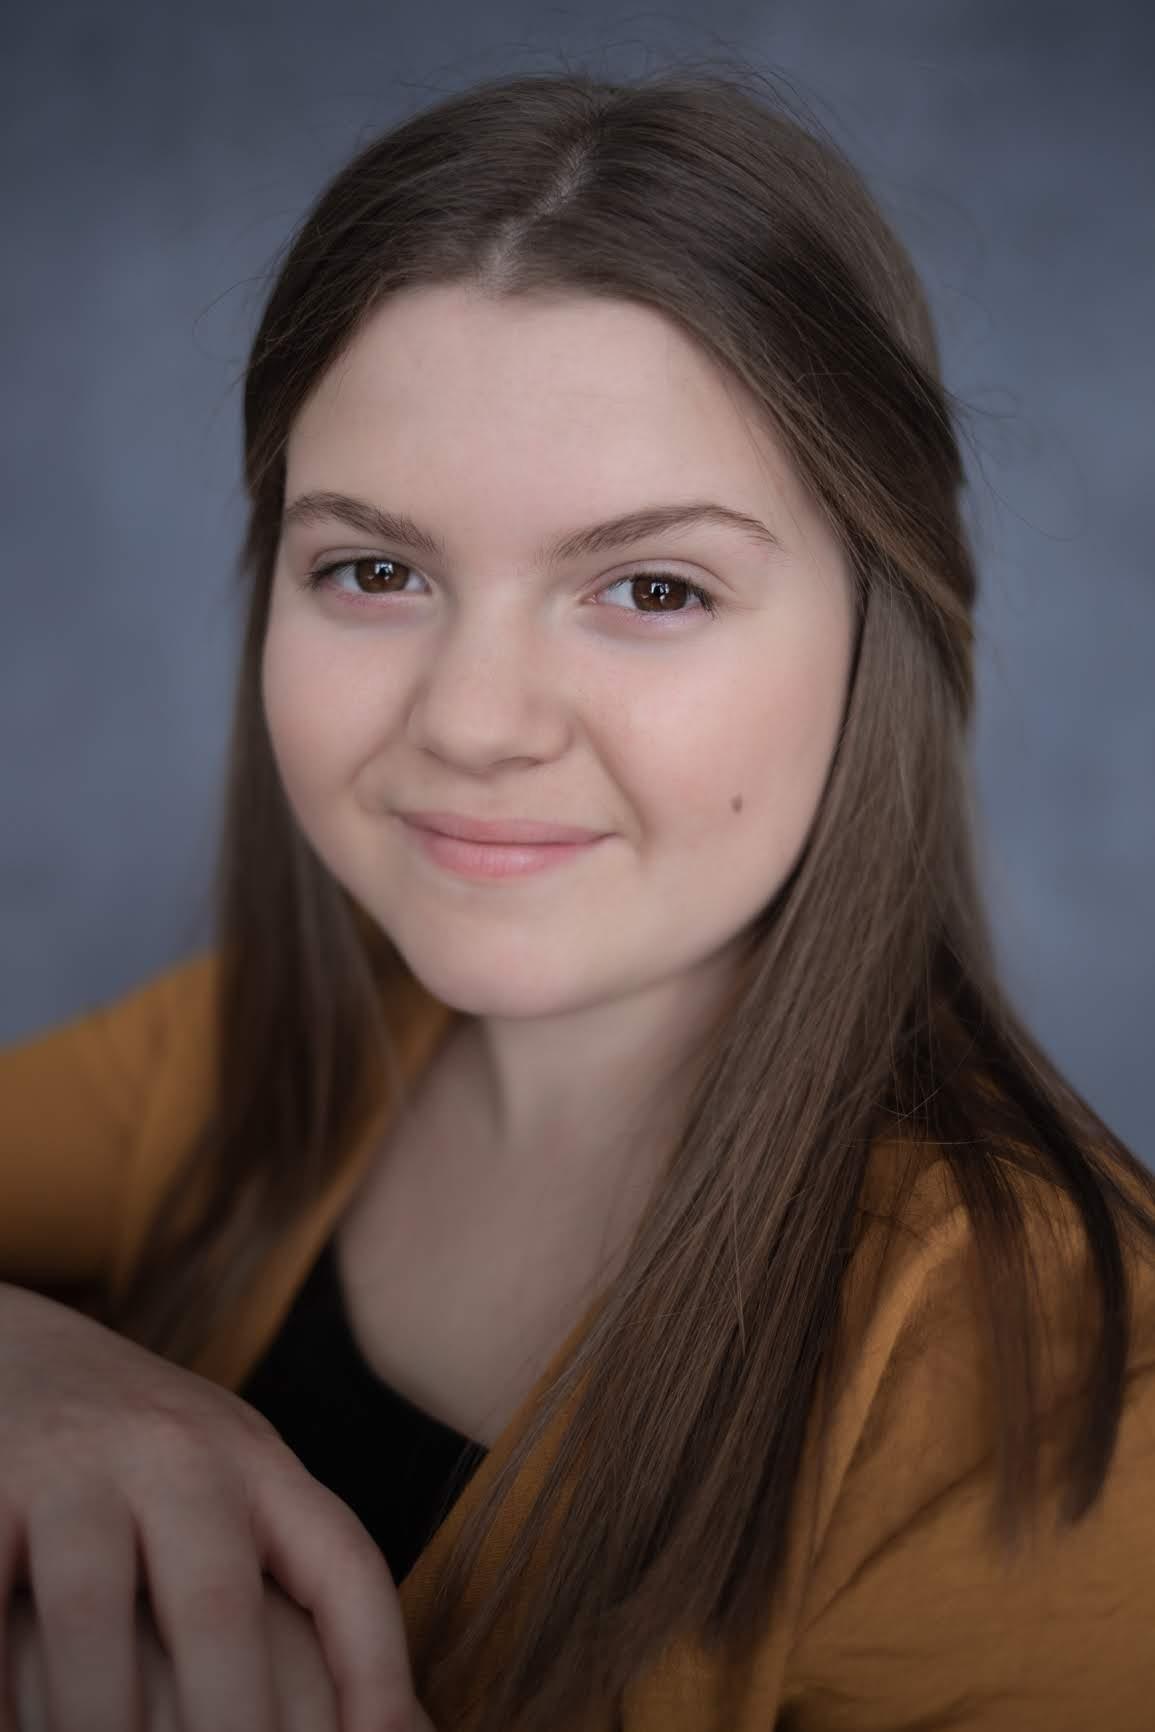 Megan Headshots Fully Edited 2mb-5705-01 (1)